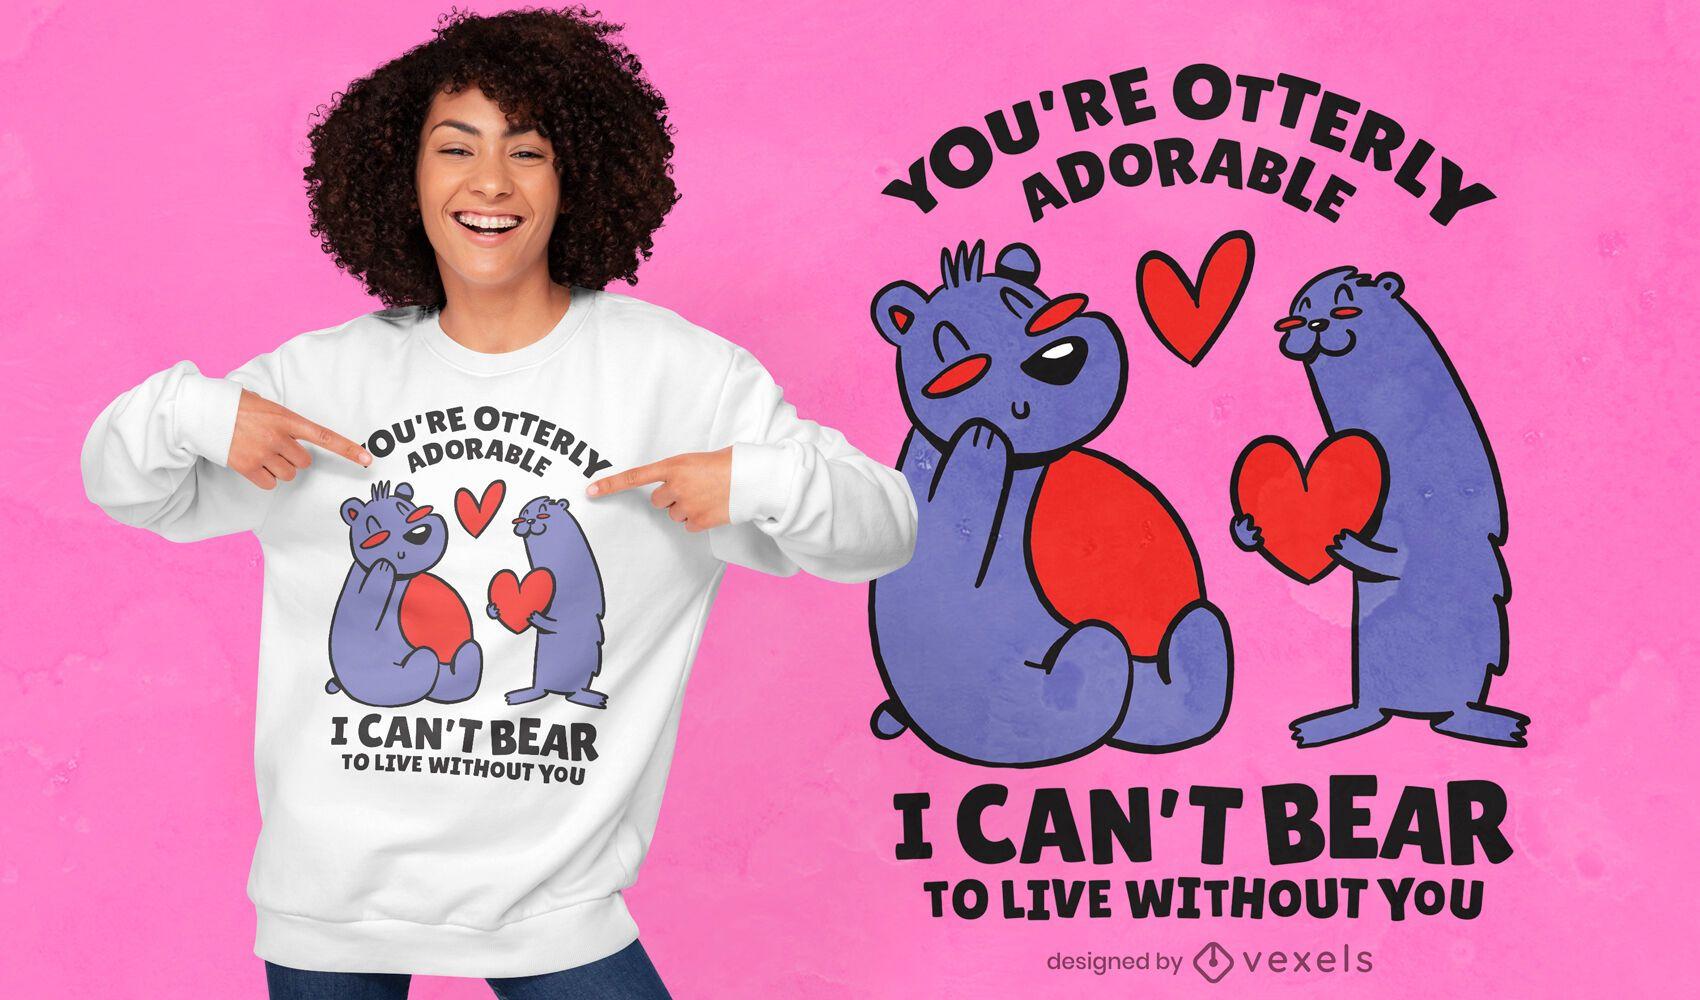 Otterly adorable t-shirt design